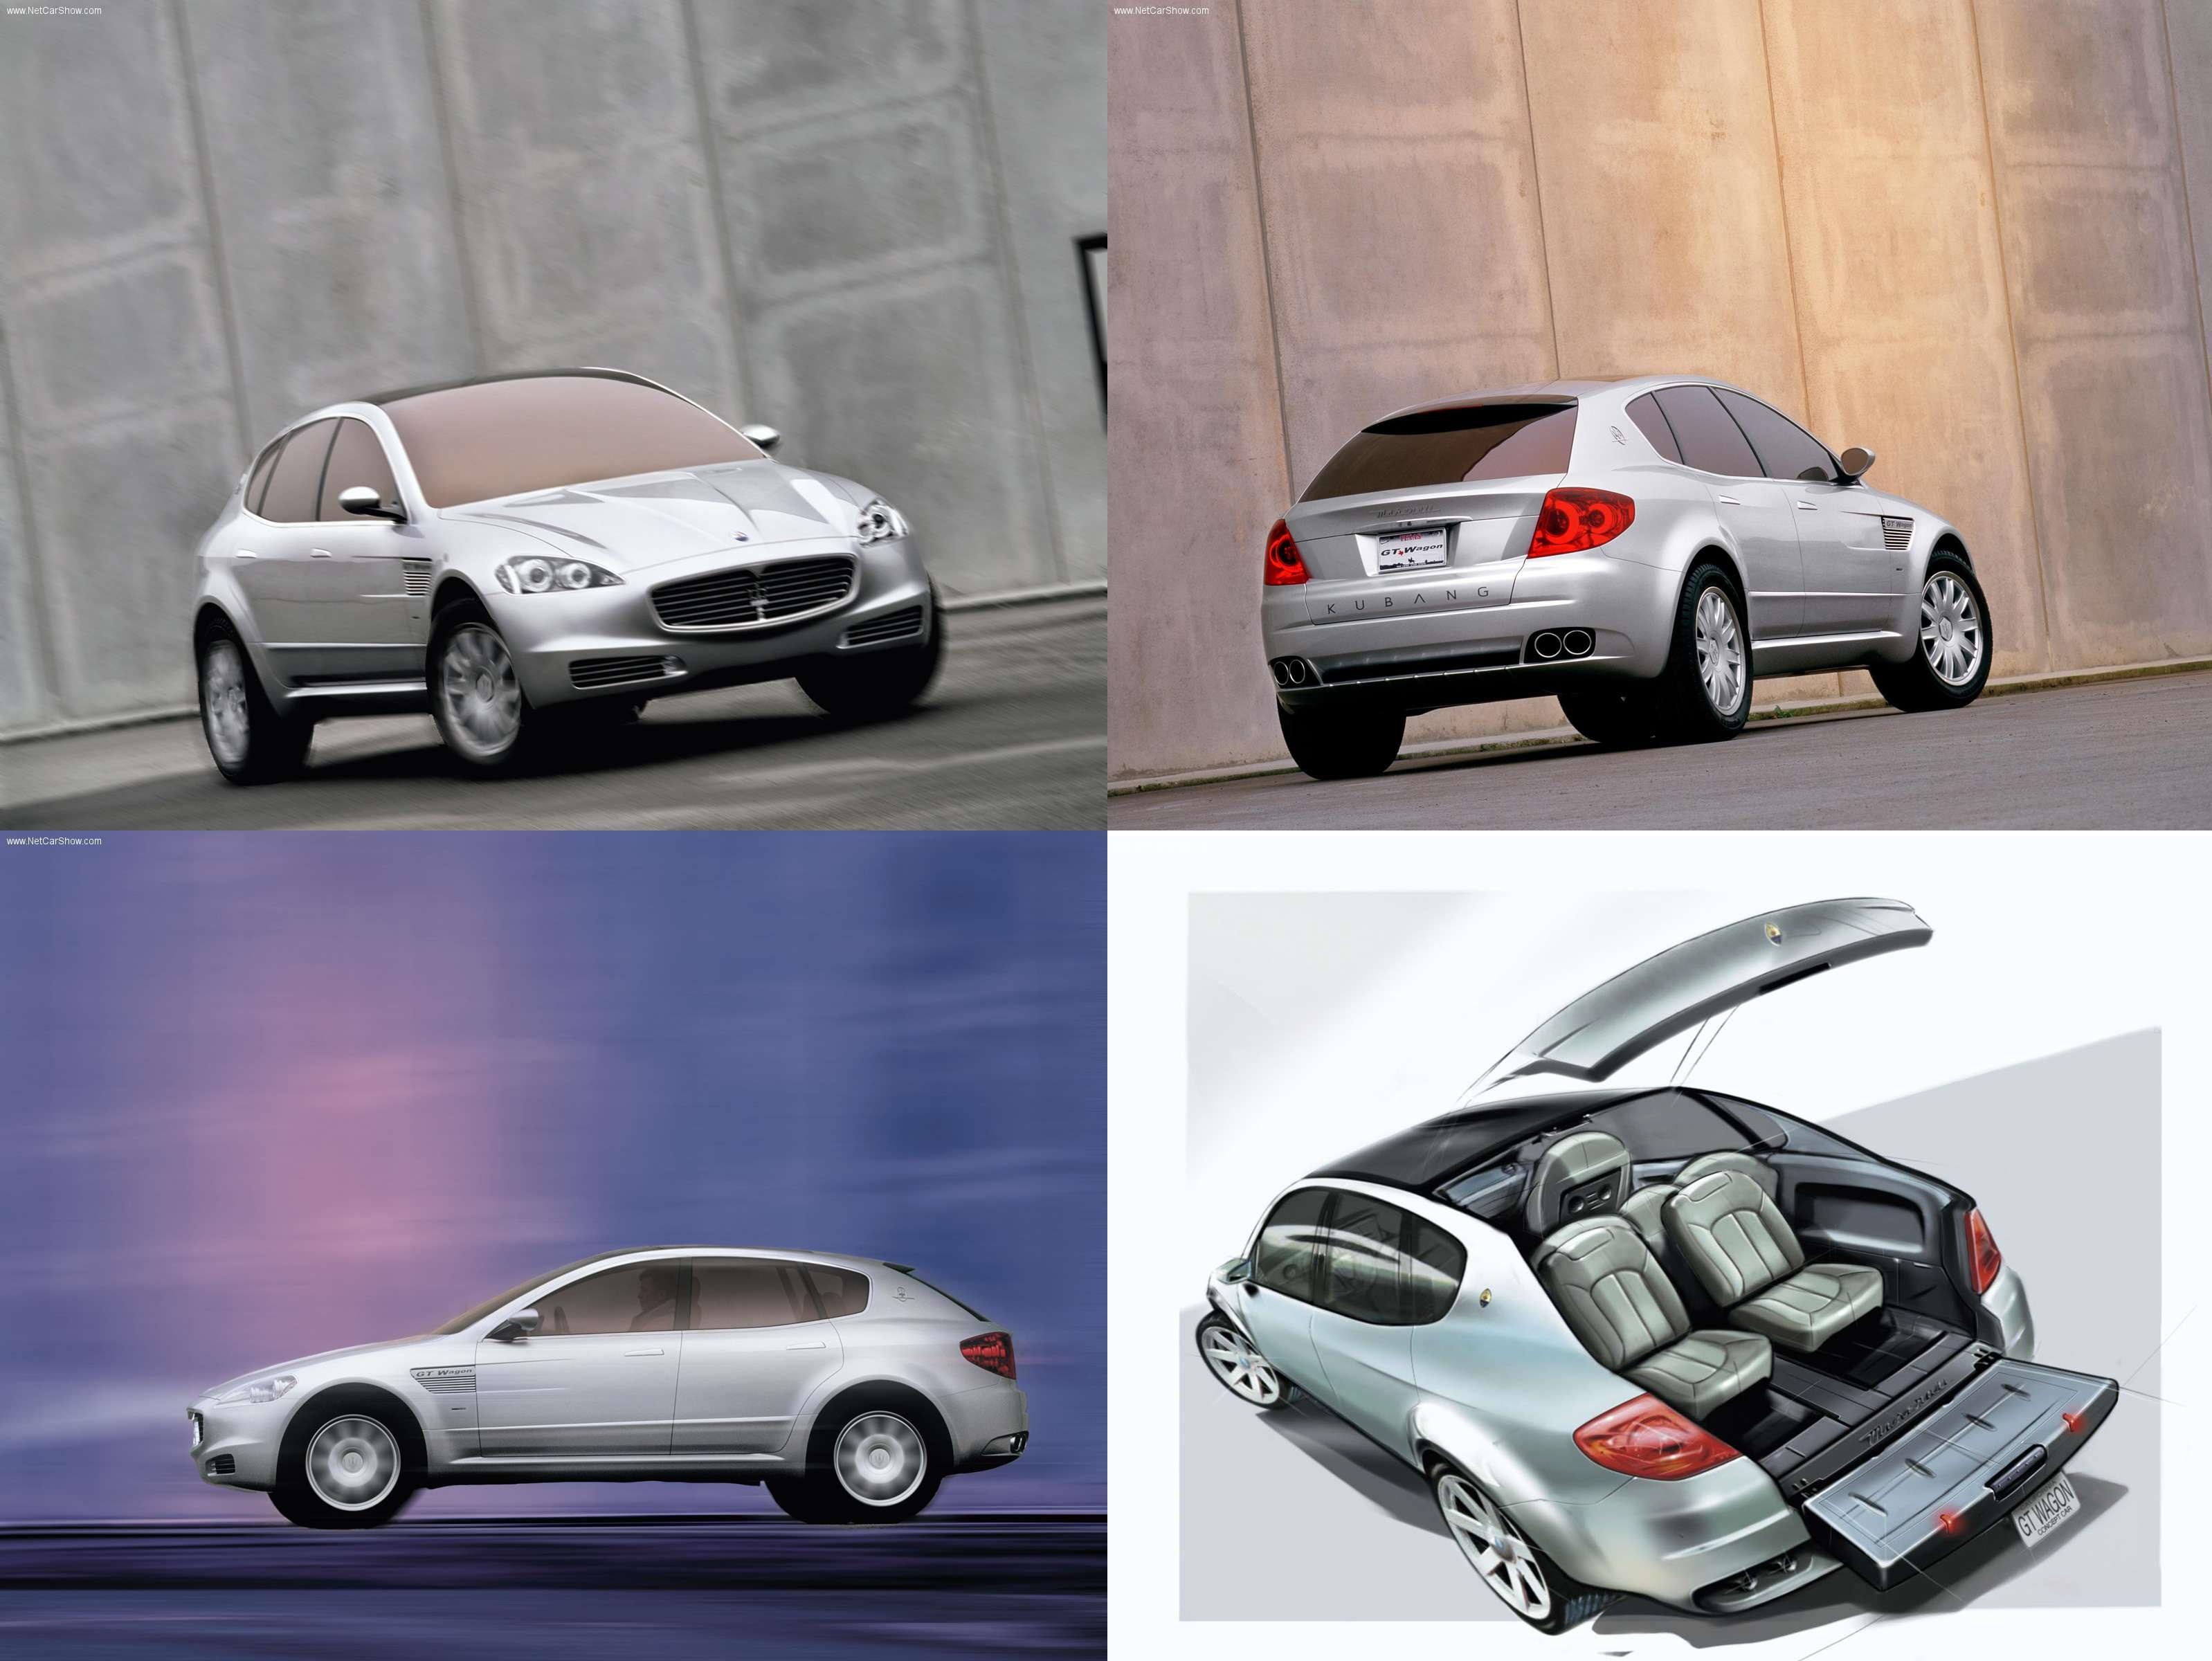 Maserati-Kubang_Concept_Car_2003_1600x1200_wallpaper_01